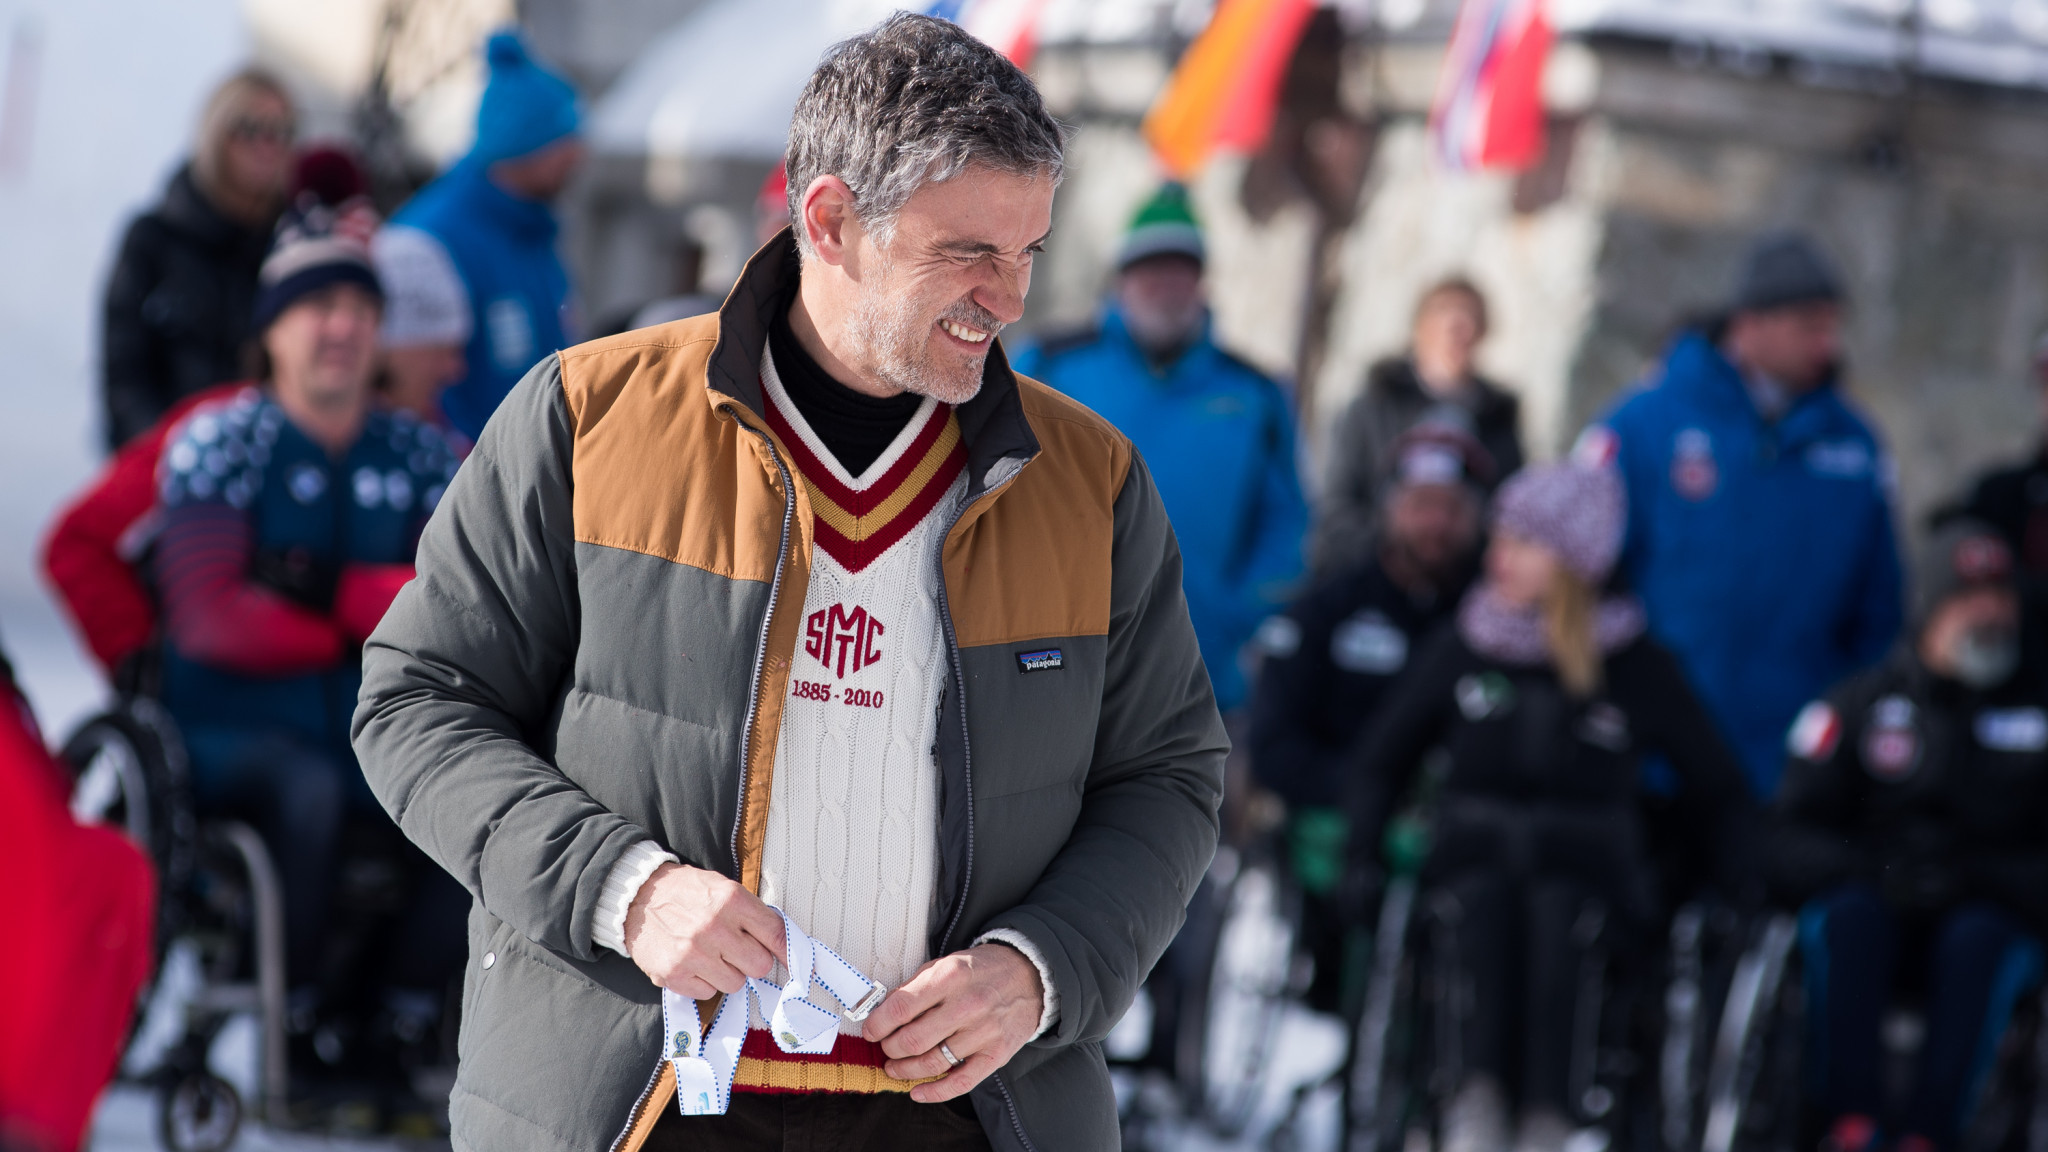 Fritz Burkard is seeking election as President of the IBSF ©Fritz Burkard